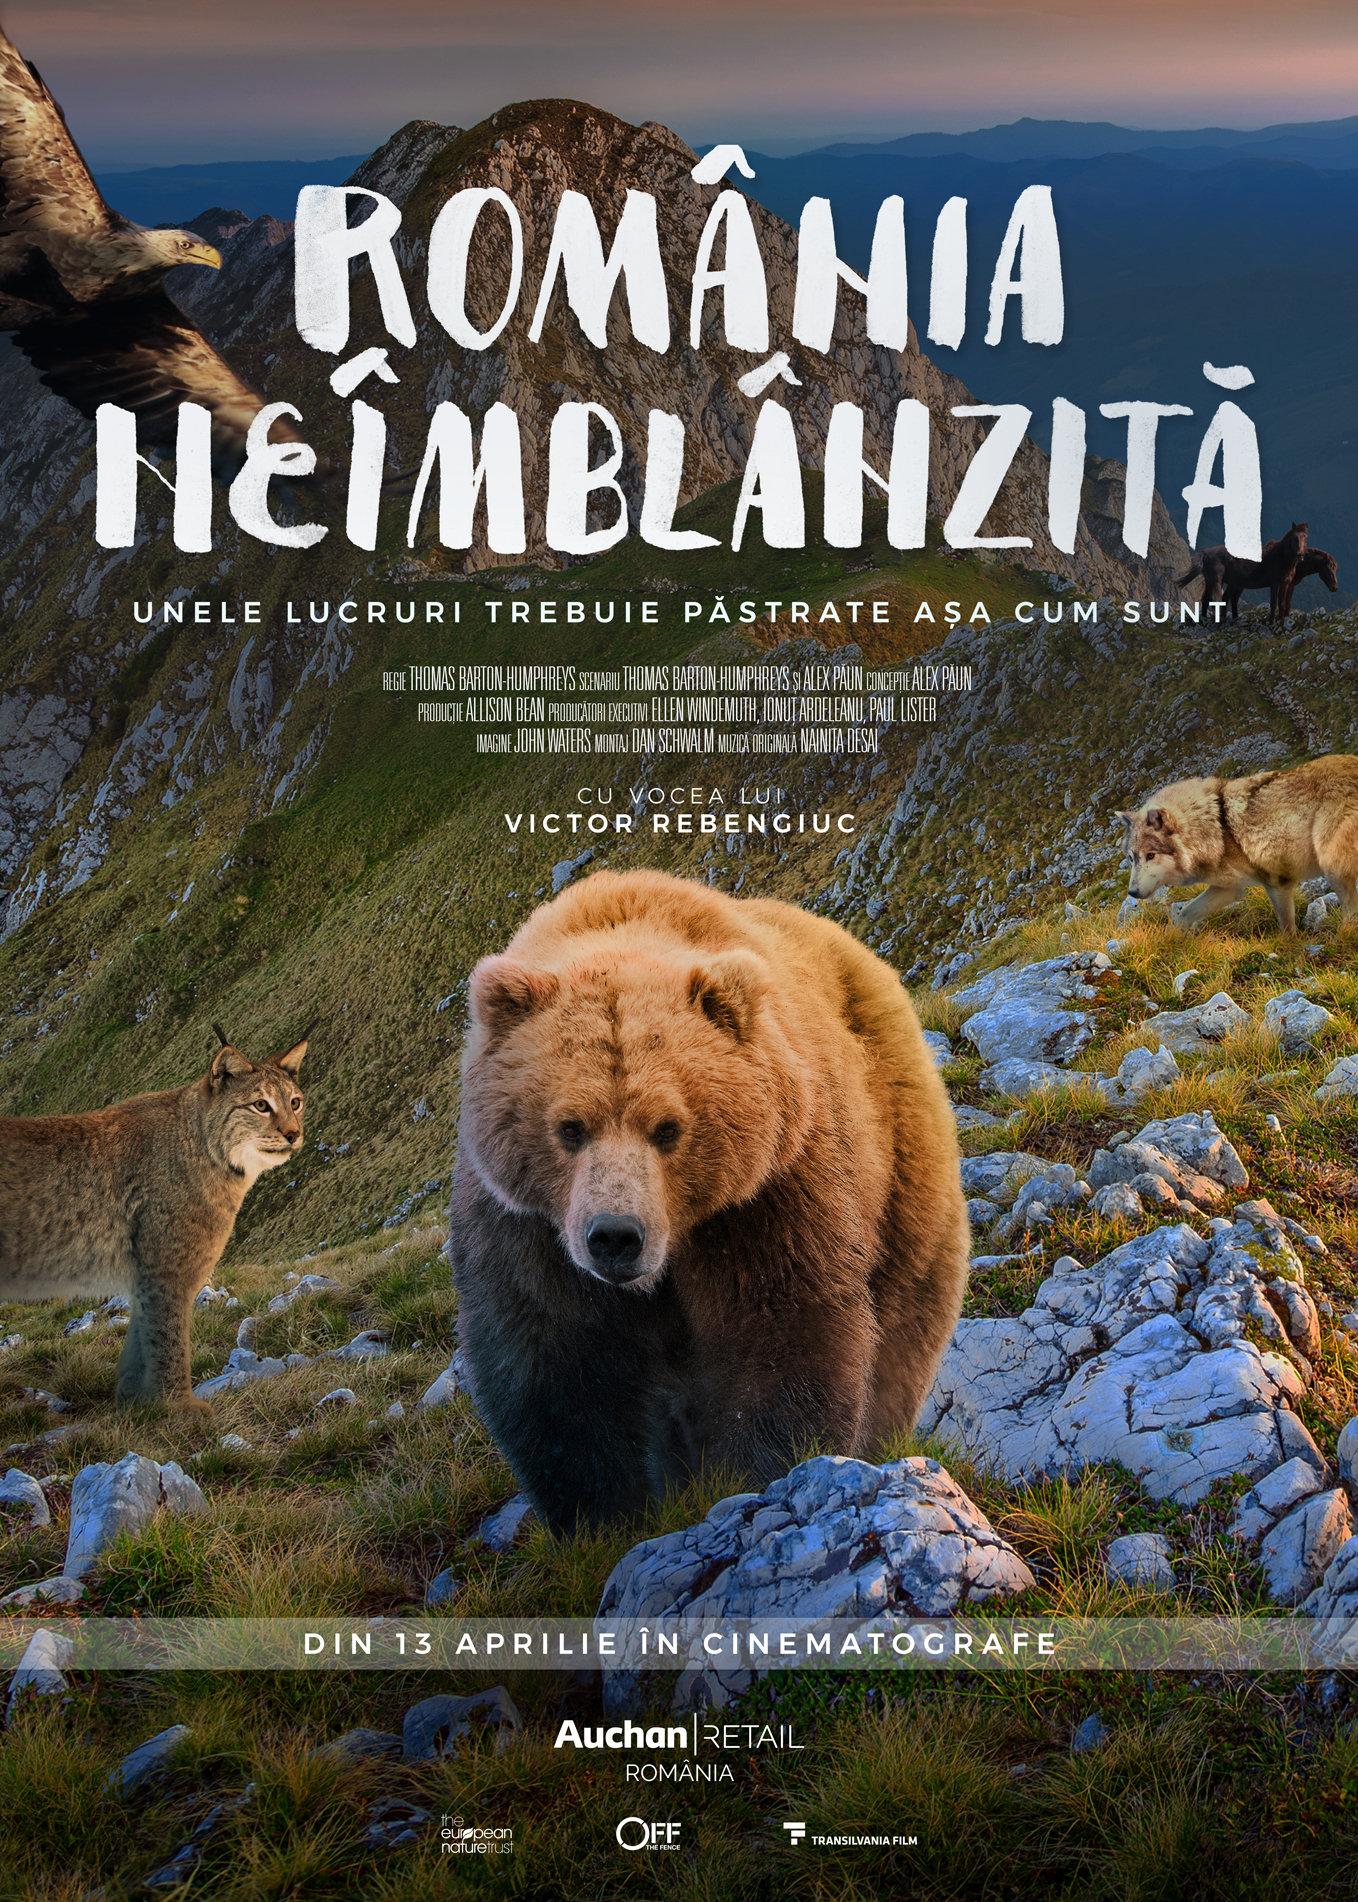 România neîmblânzită (2018) - Photo